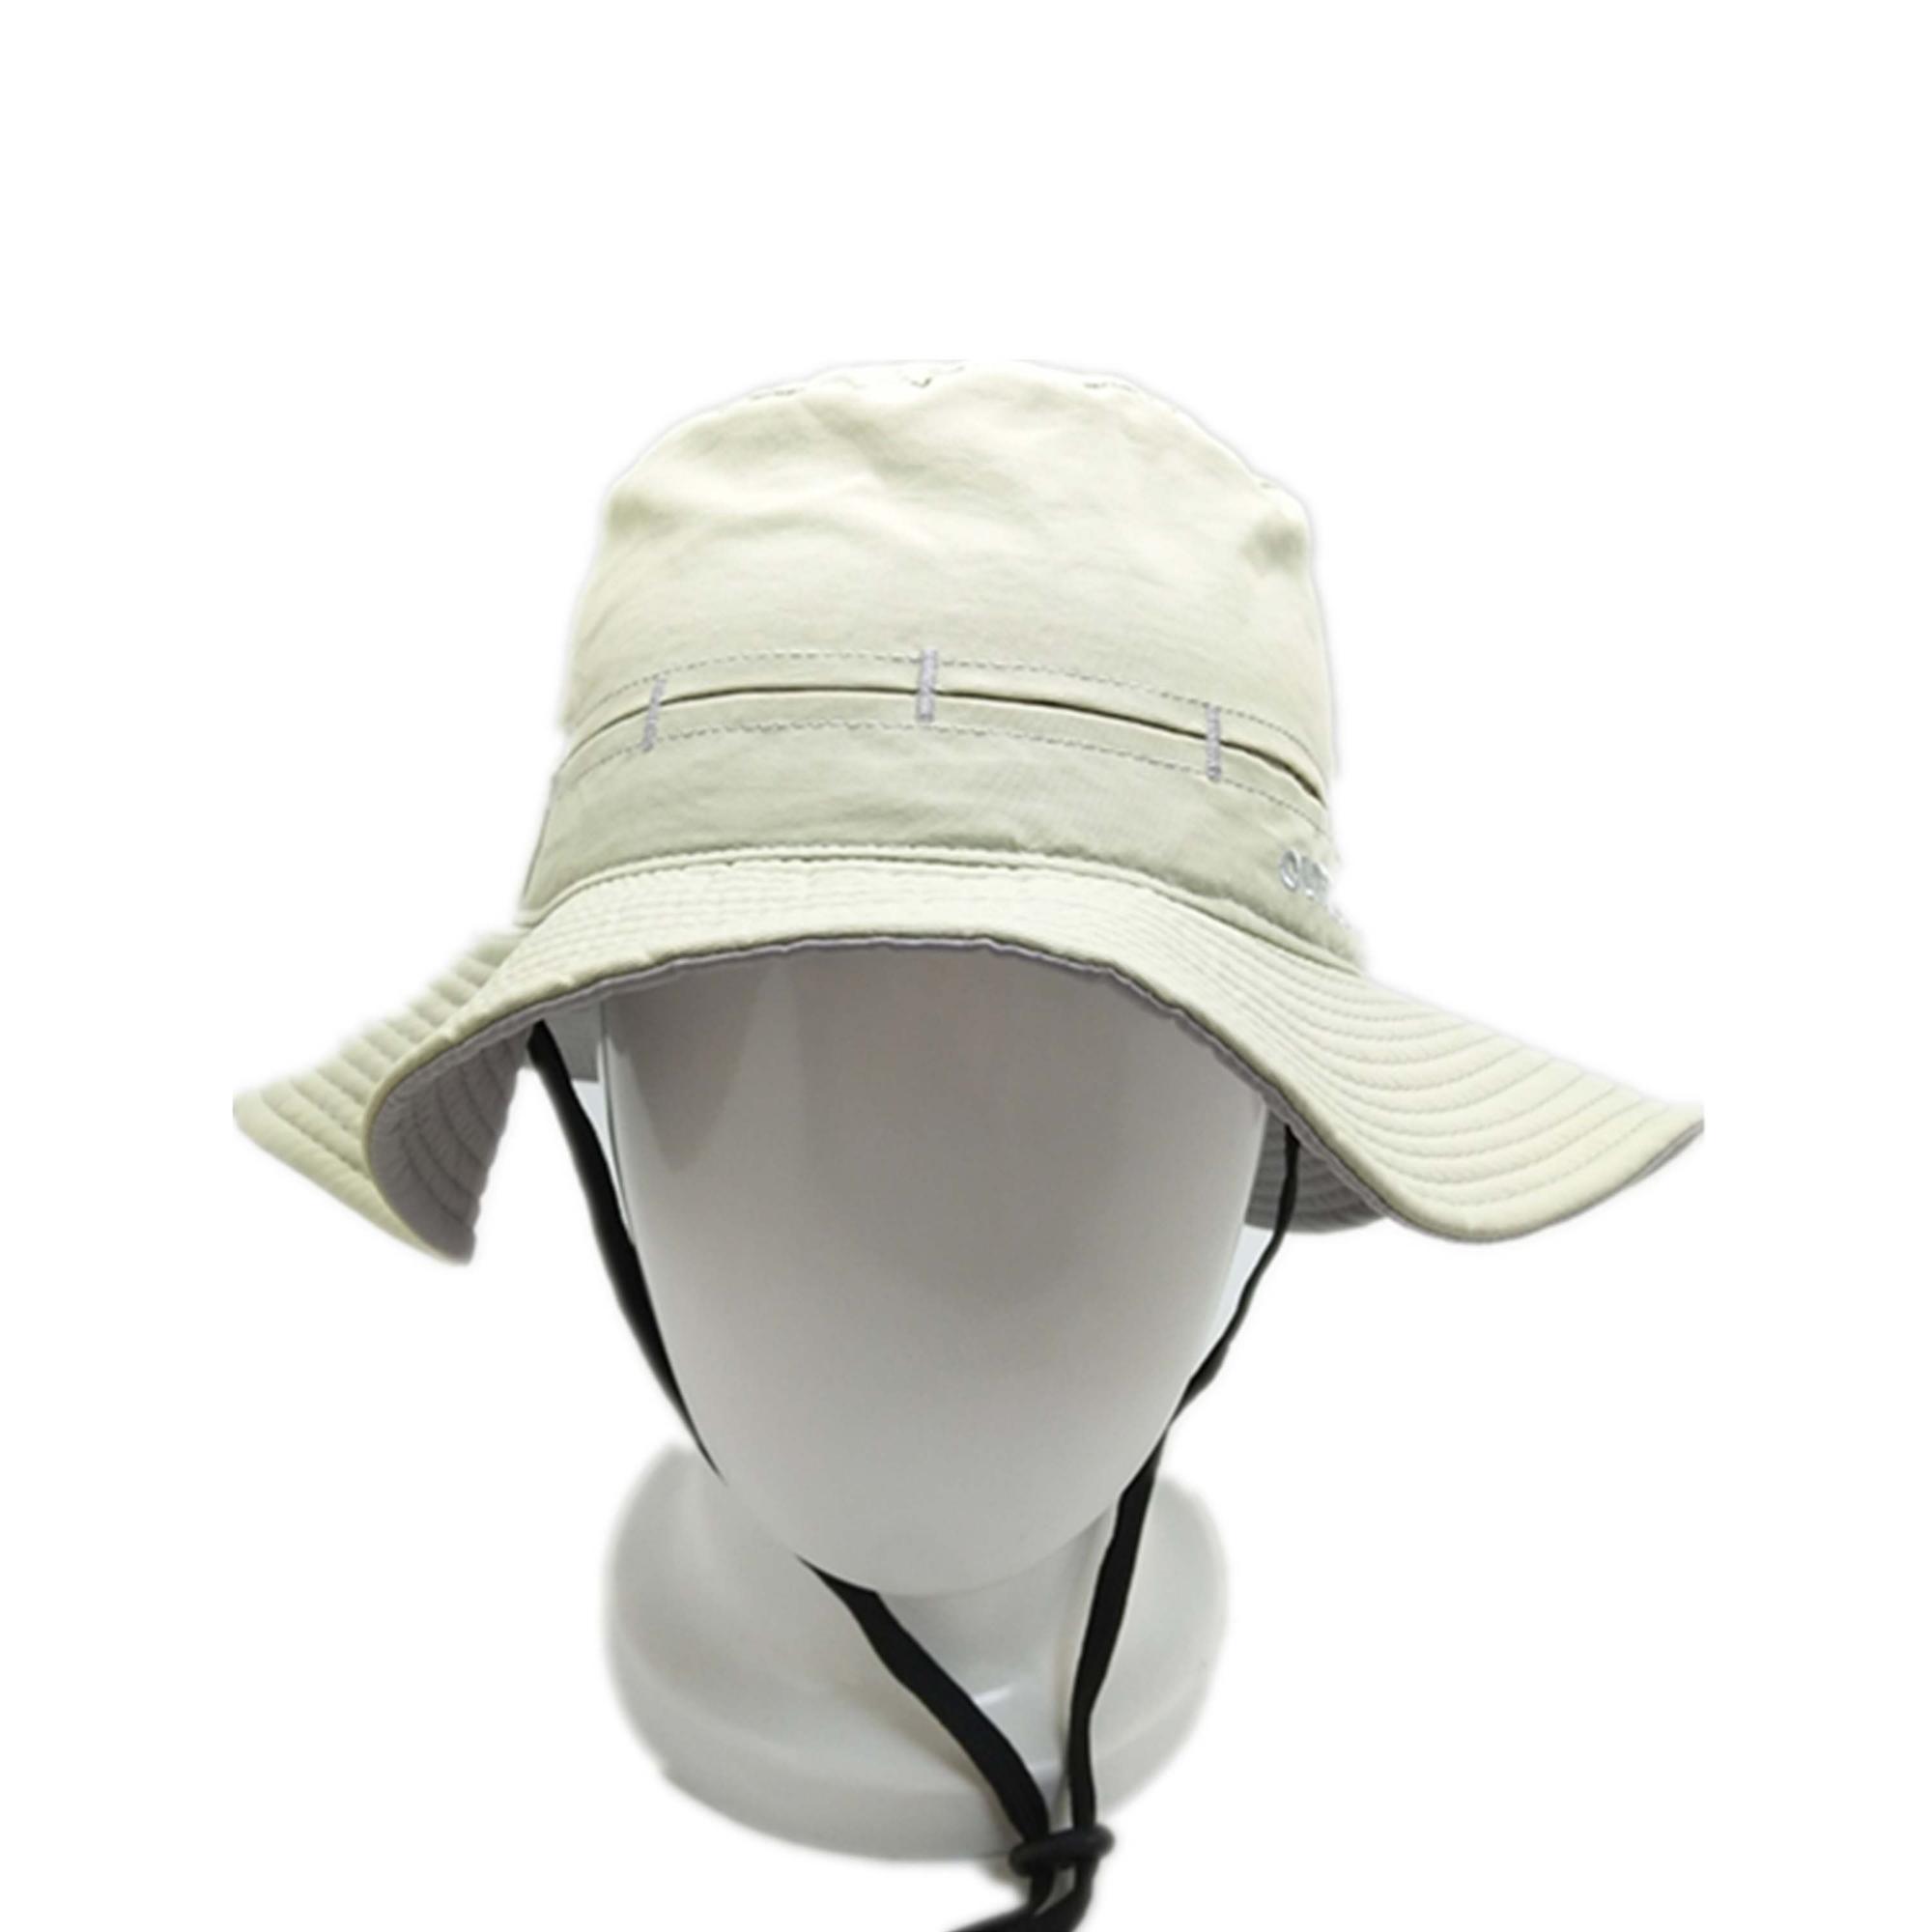 3a631a082014b5 Custom Funny Bucket Hat Sports Outdoor Sun Cap Cotton Fishing Hat ...